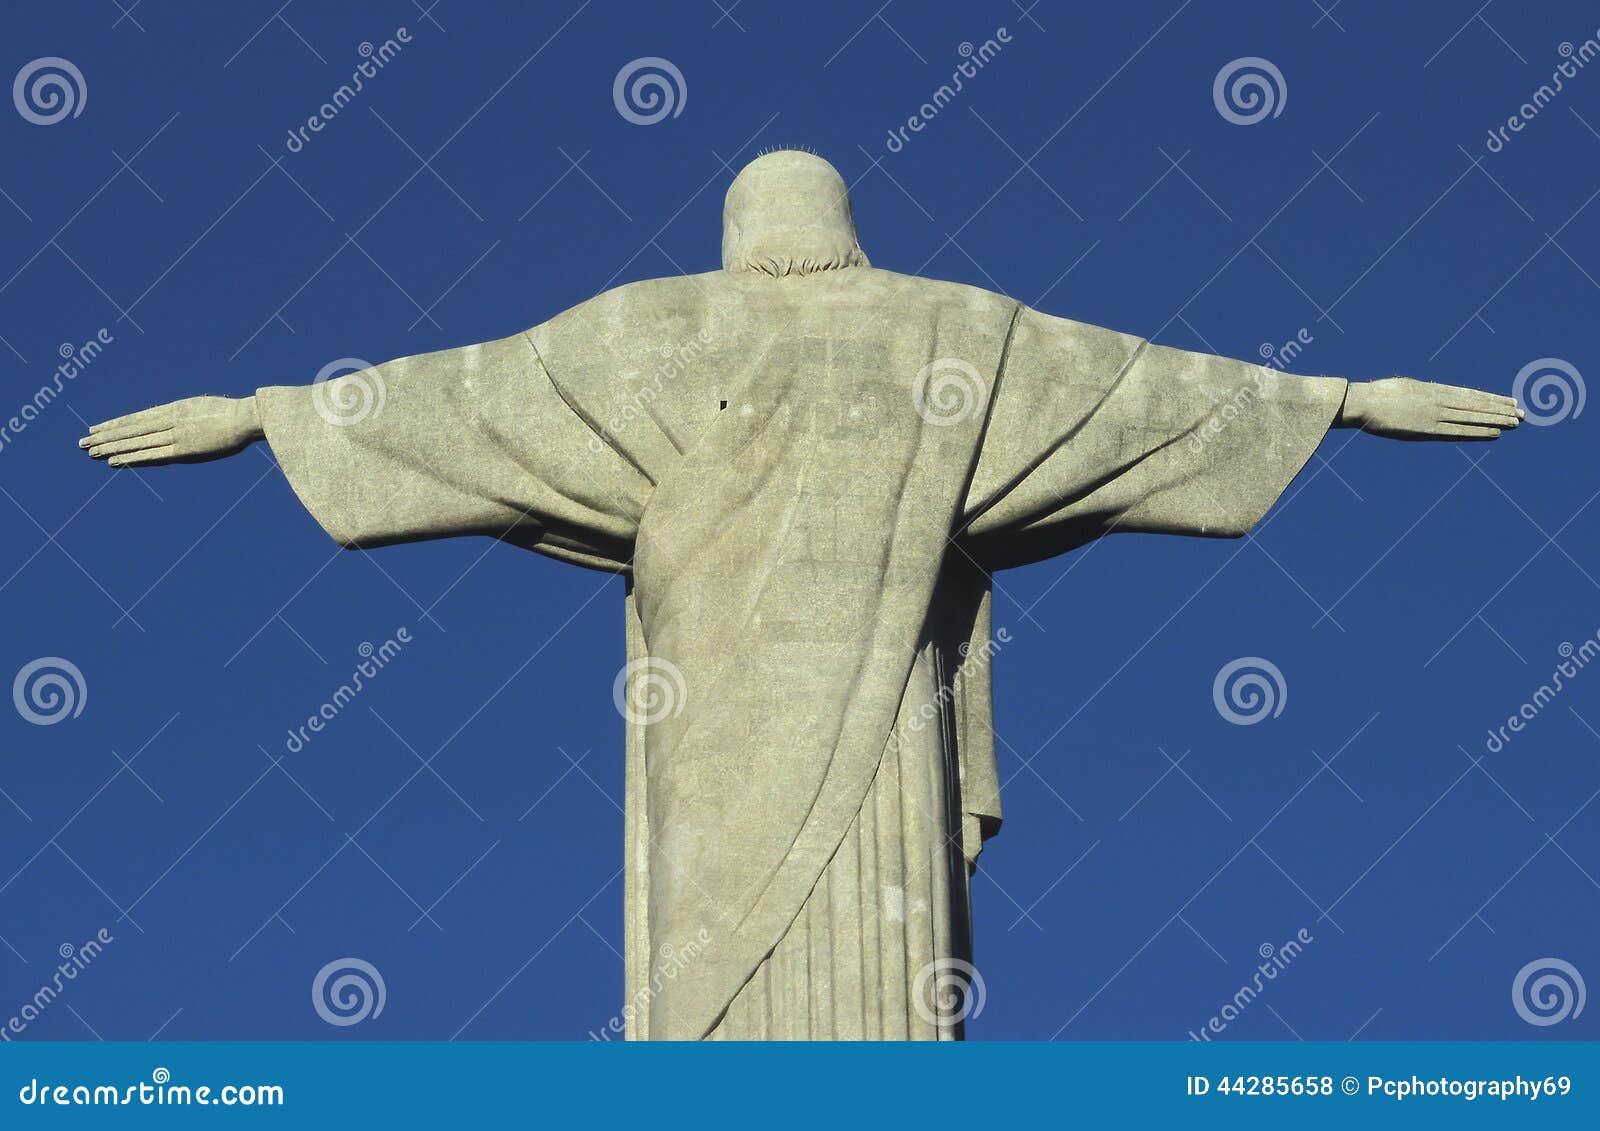 Statue of Christ the Redeemer, Rio de Janeiro, Brazil.